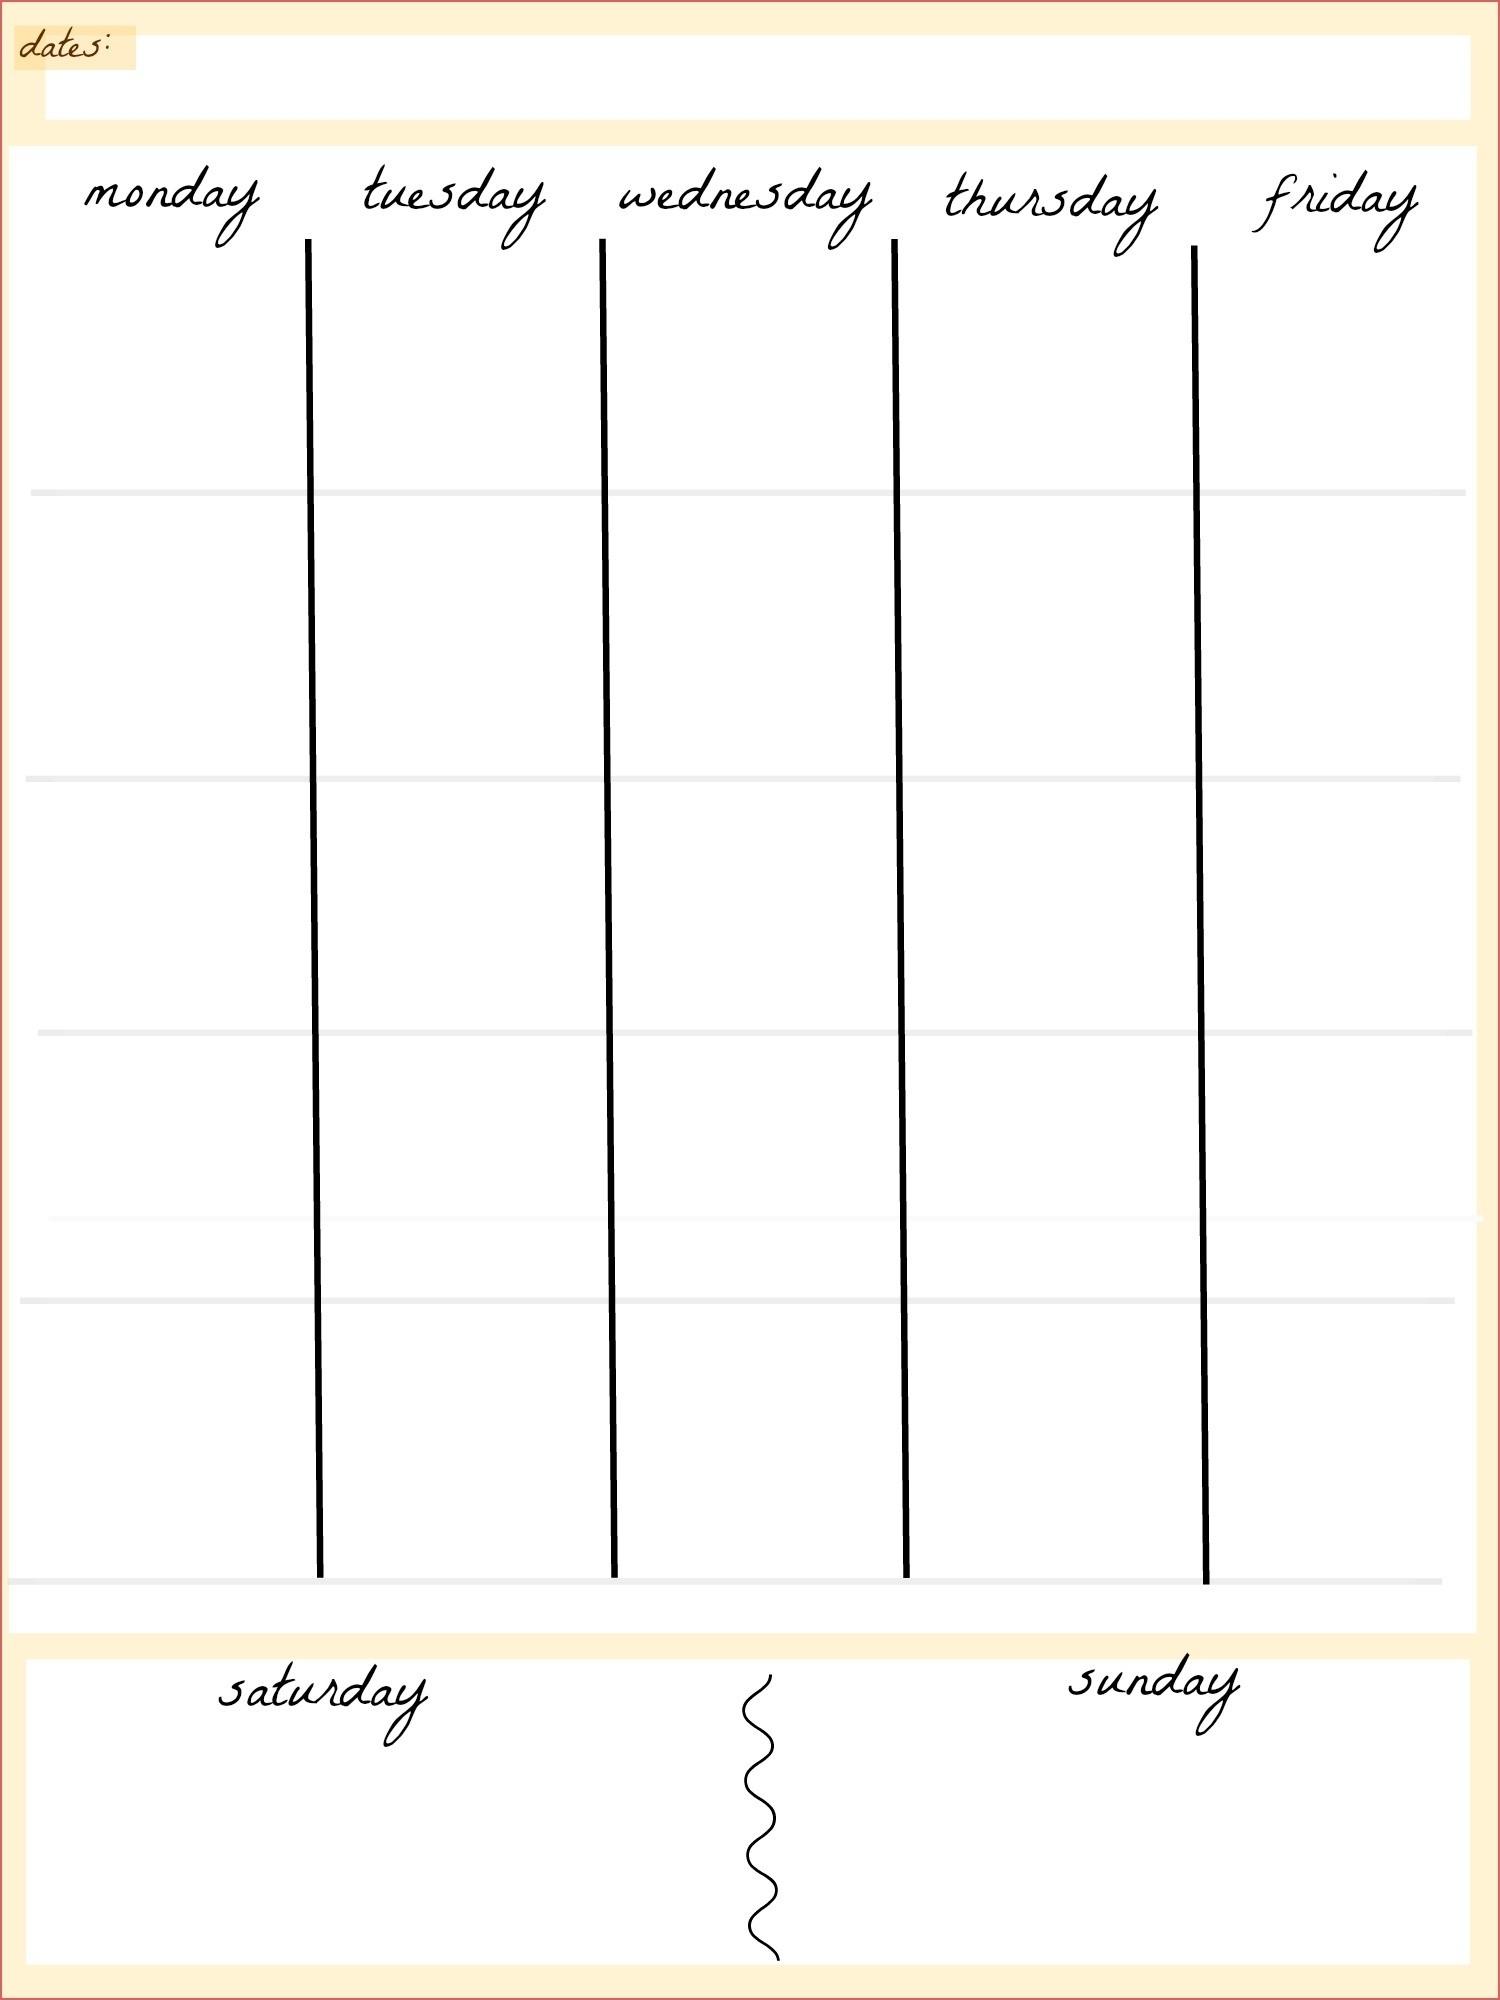 Blank 5 Day Calendar Printable - Calendar Inspiration Design